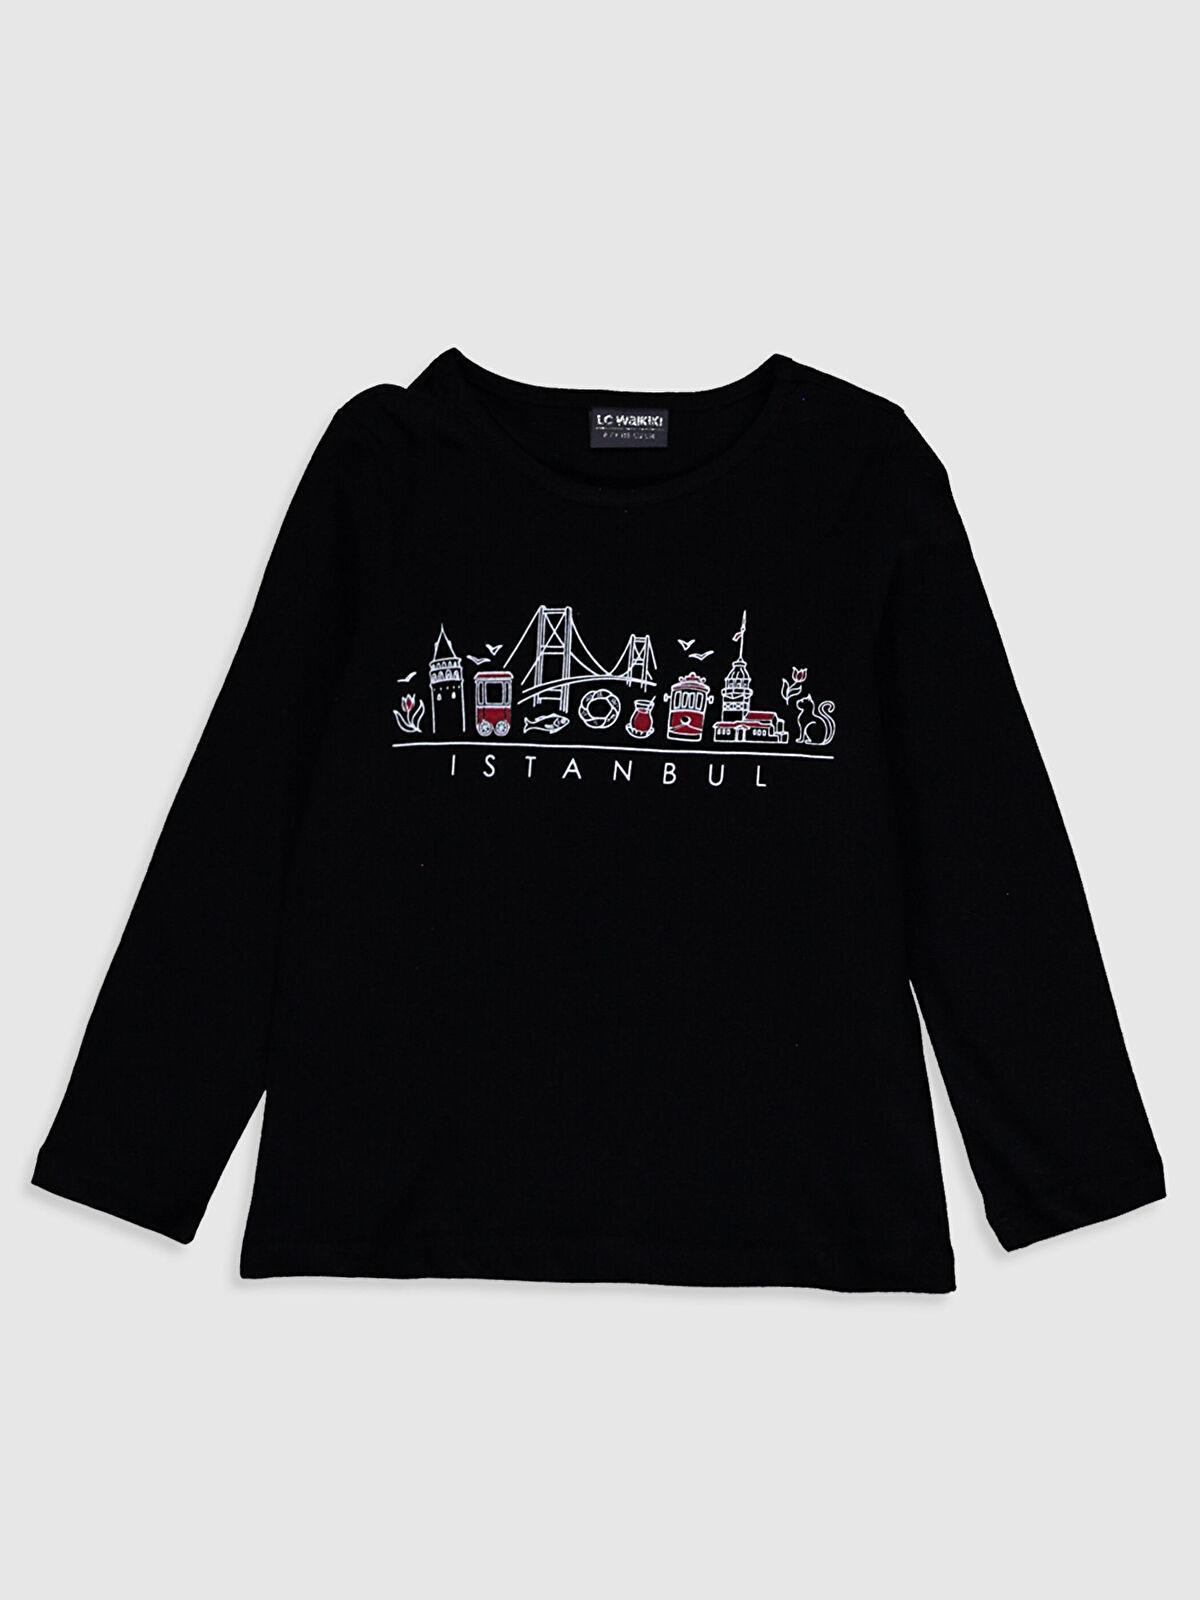 Kız Çocuk İstanbul Temalı Tişört - LC WAIKIKI